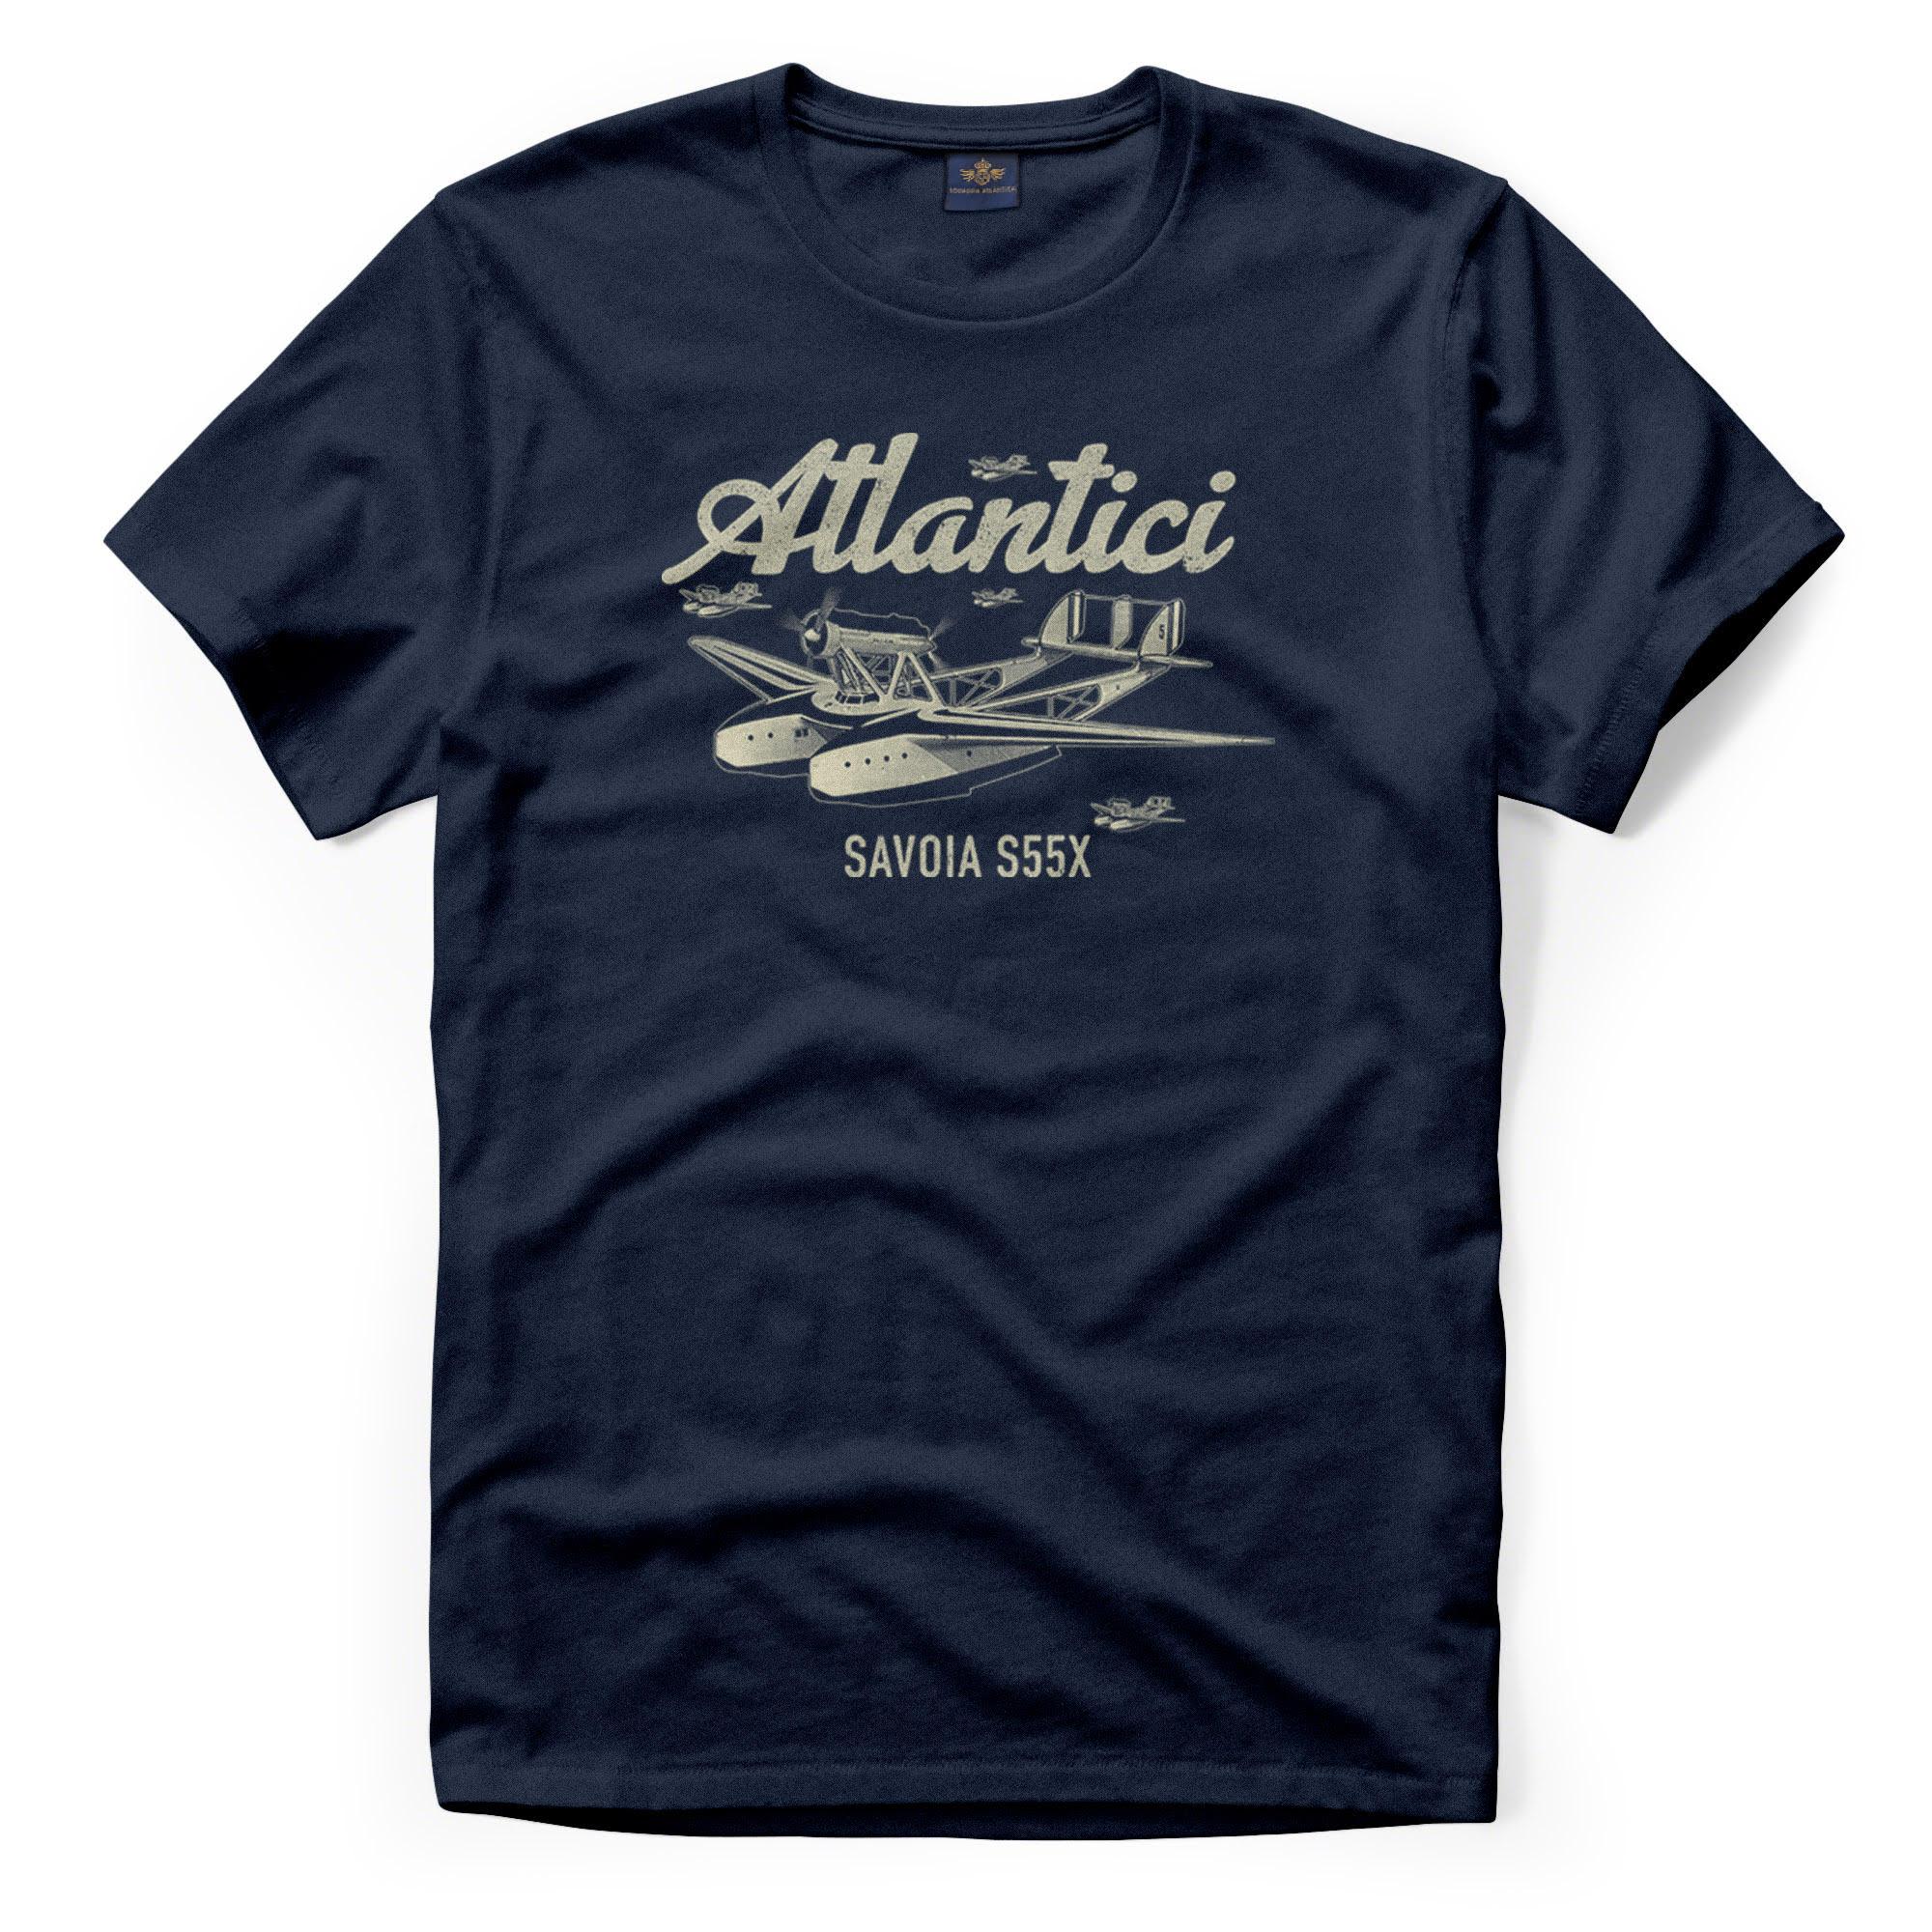 Tshirt Atlantici Squadratlantica